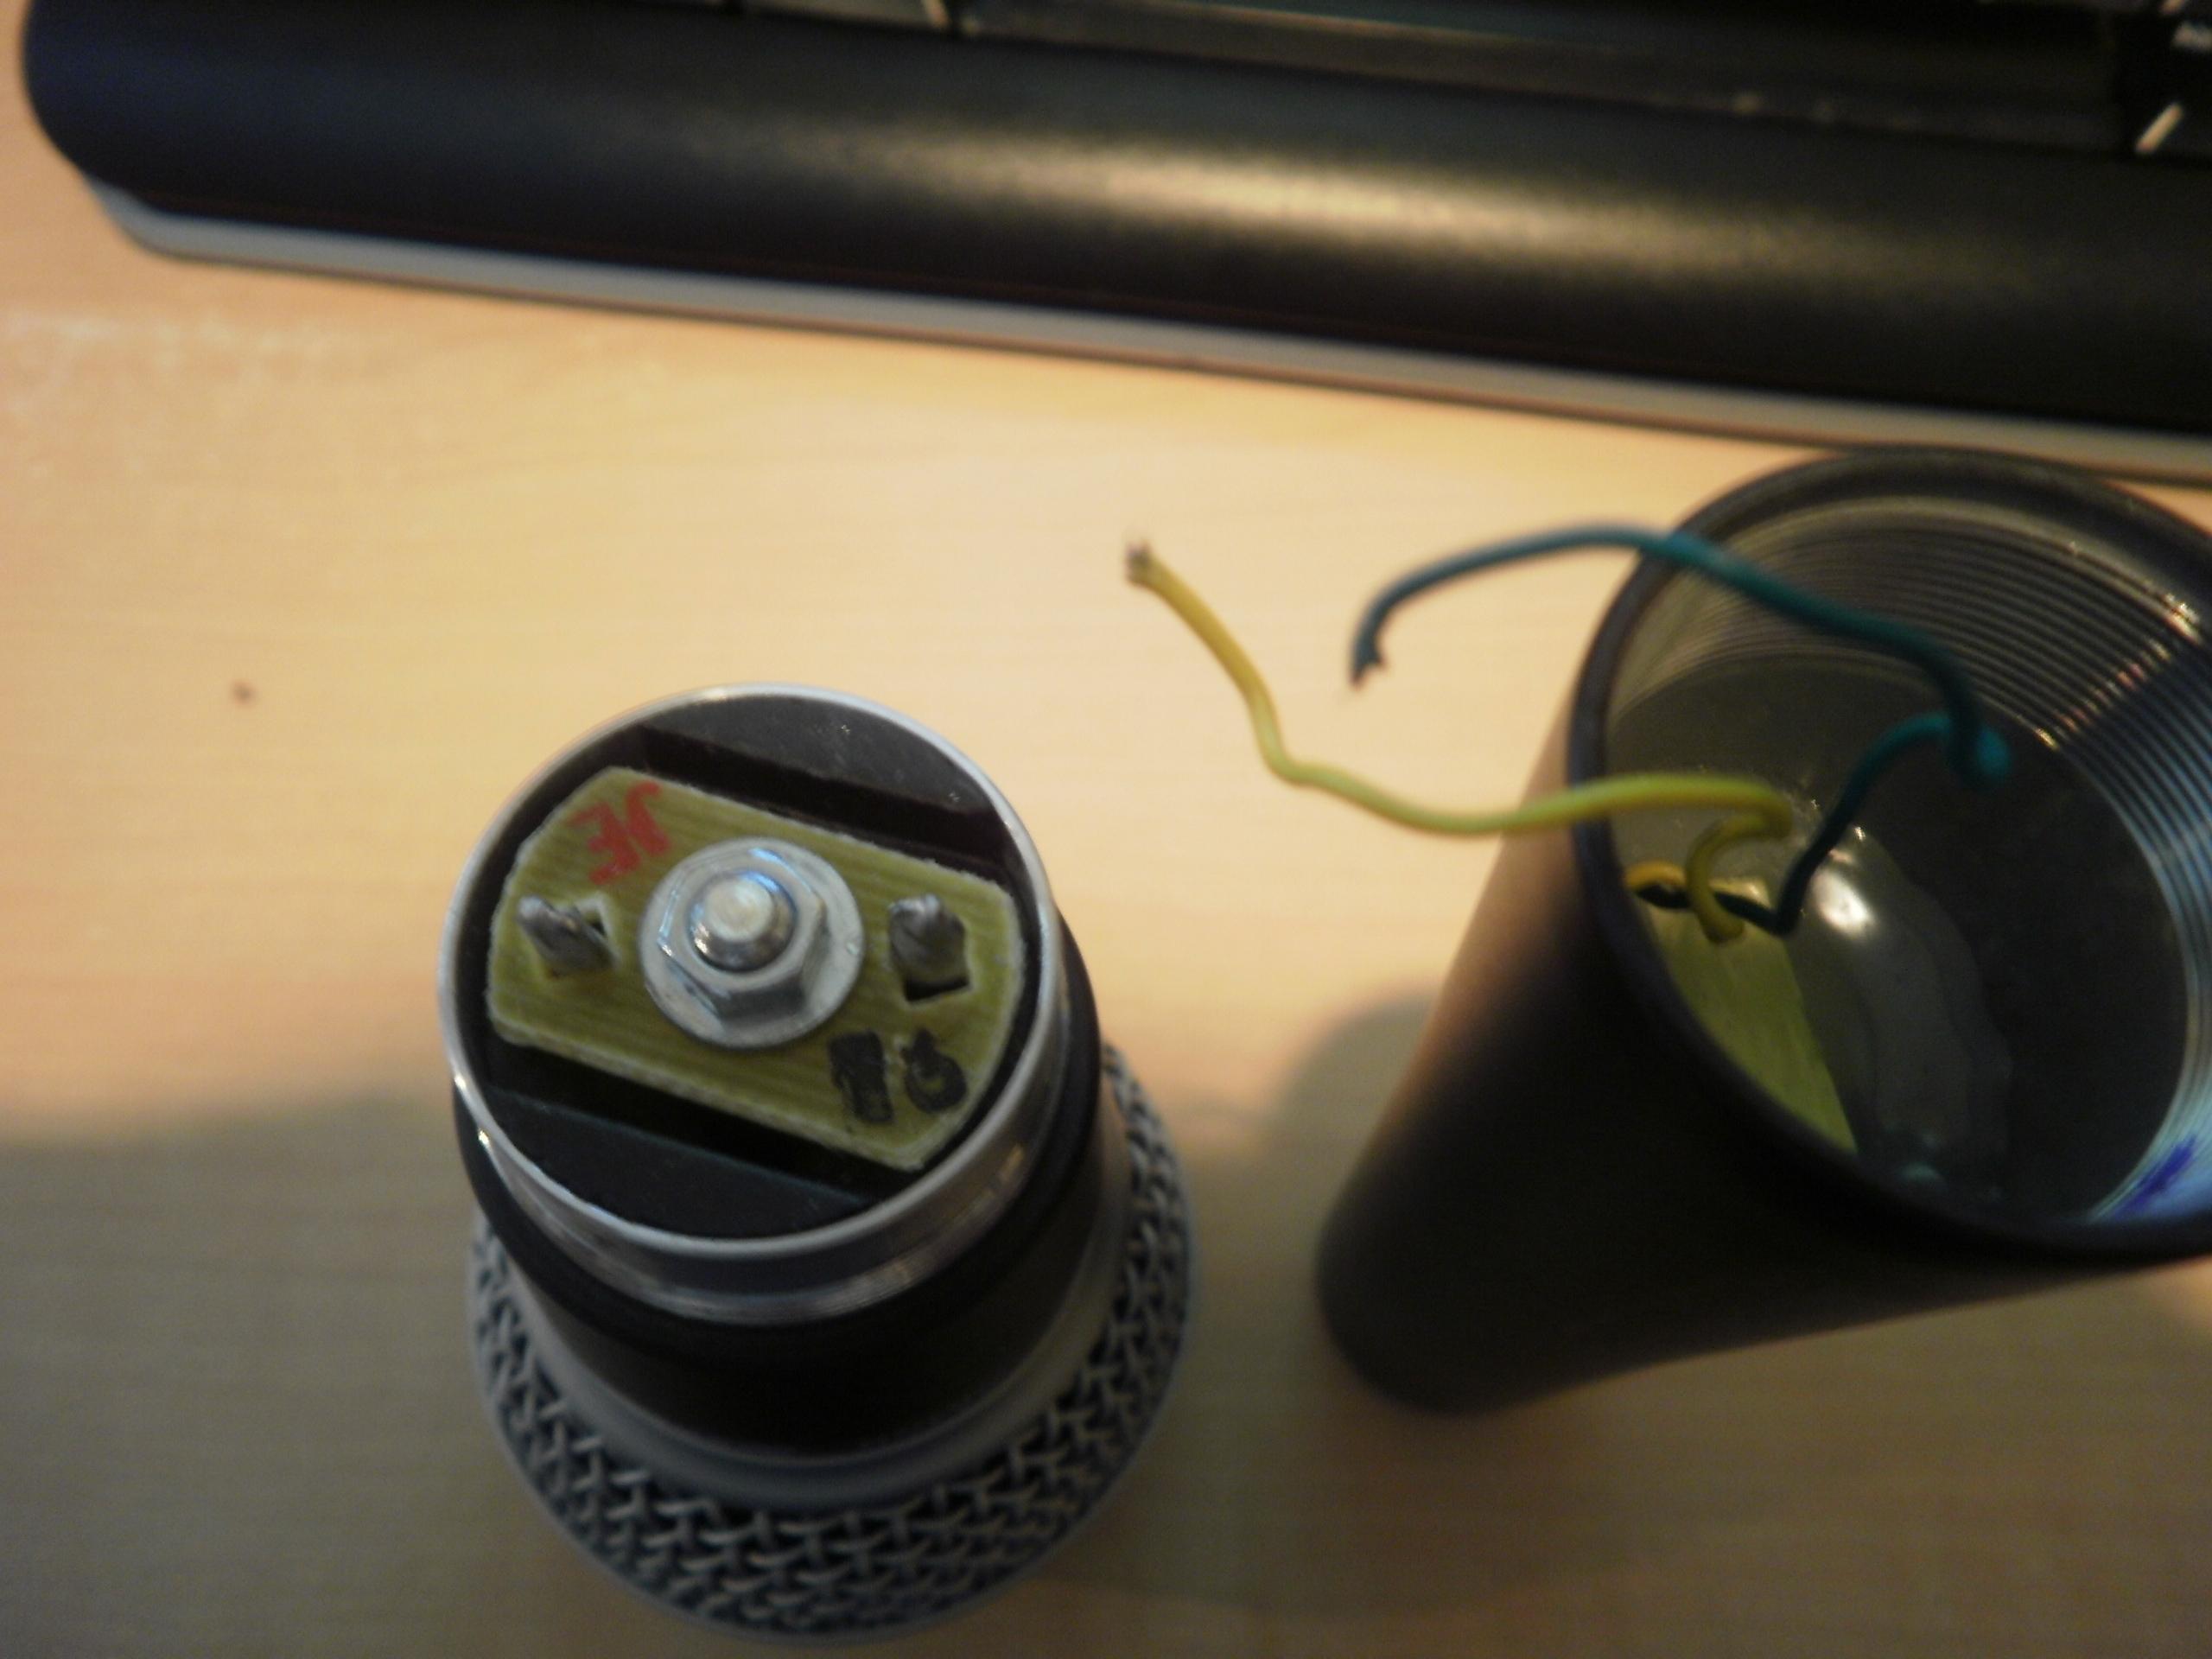 shure sm58 wiring green yellow shure image wiring i need help repairing an sm58 gearslutz pro audio community on shure sm58 wiring green yellow